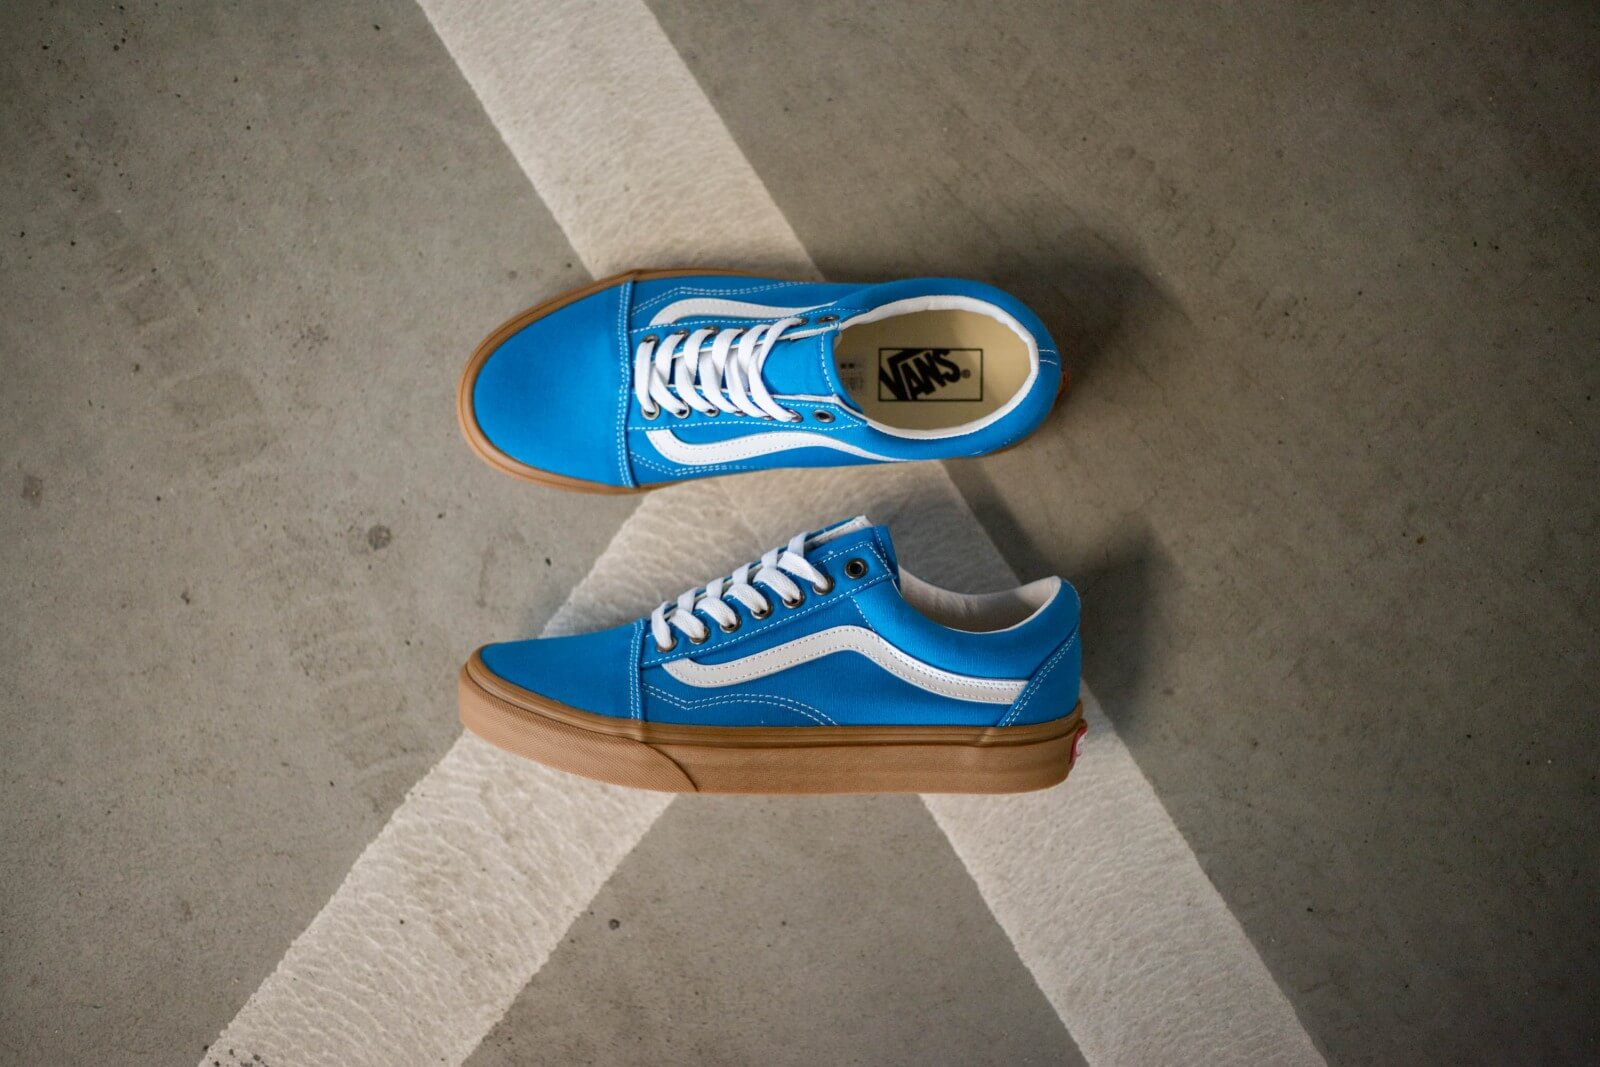 Vans Old Skool Gum/Mediterranian Blue/True White - VN0A4U3BWYZ1